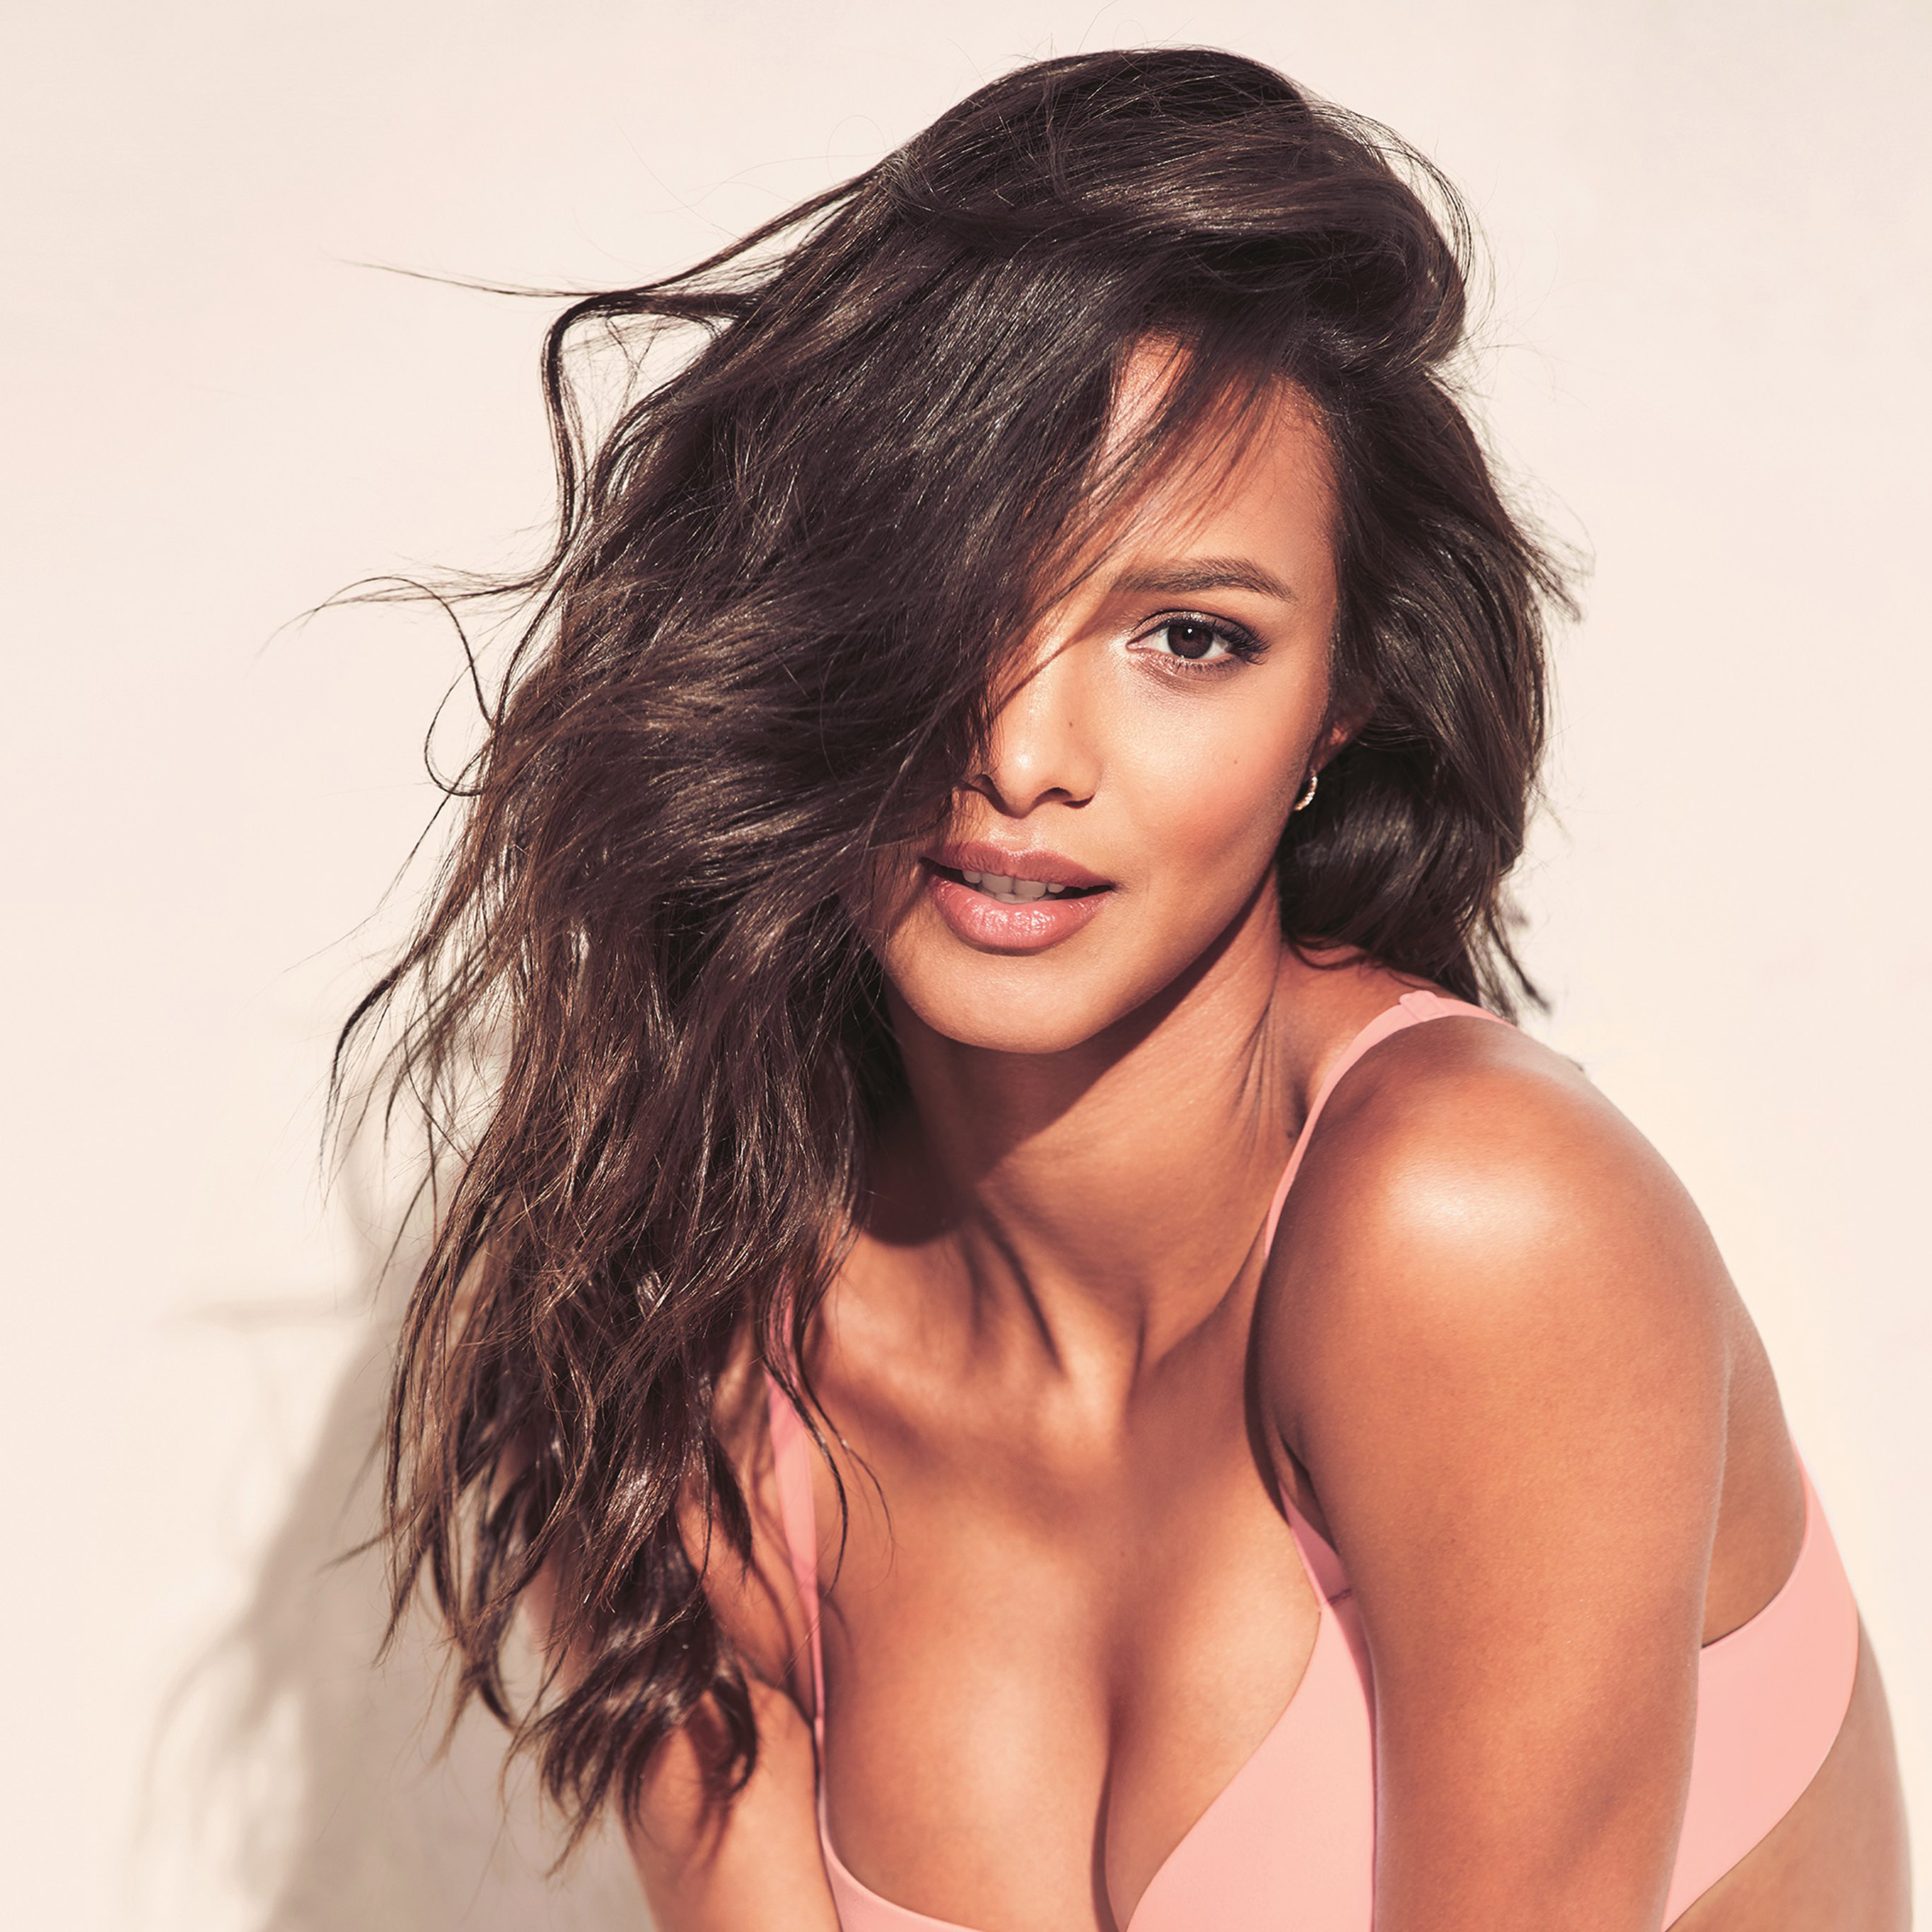 Hs41 Girl Model Photoshoot Beauty Victoria Wallpaper